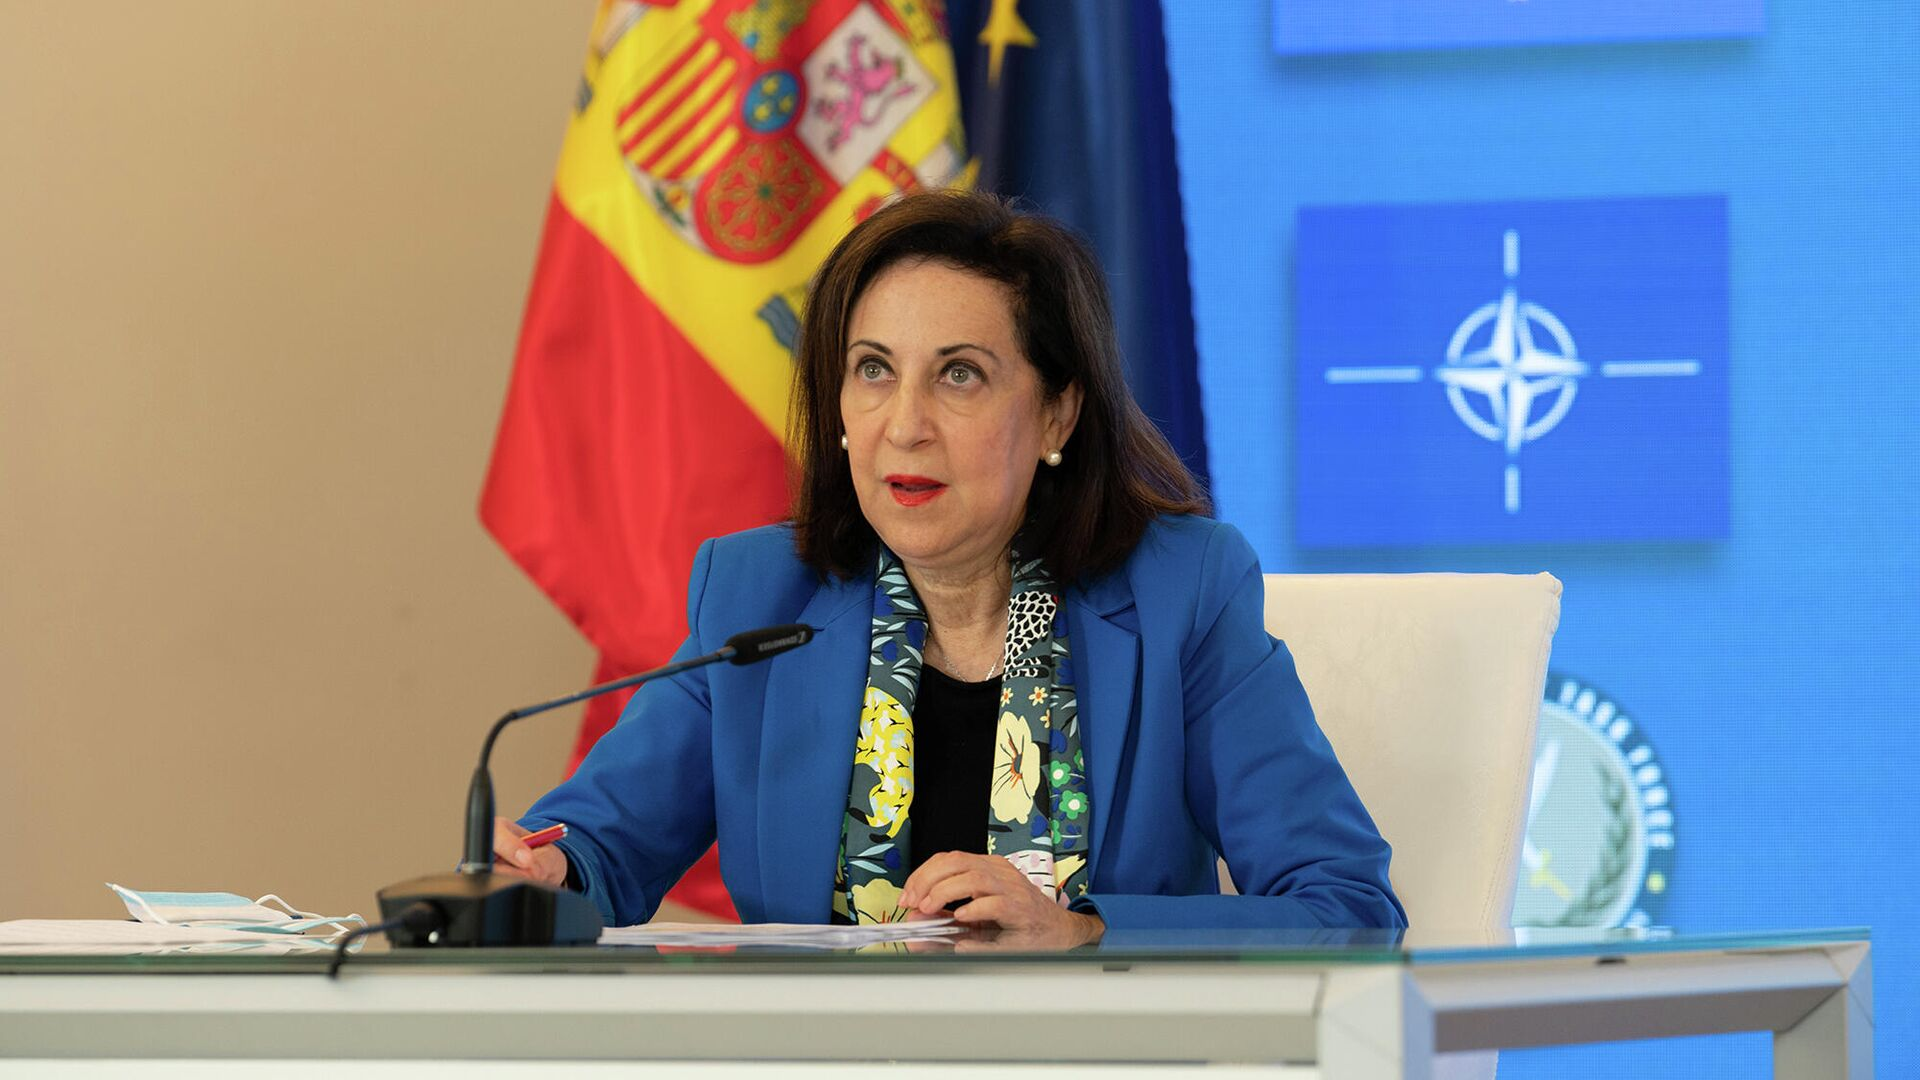 Margarita Robles, la ministra de Defensa de España - Sputnik Mundo, 1920, 13.03.2021